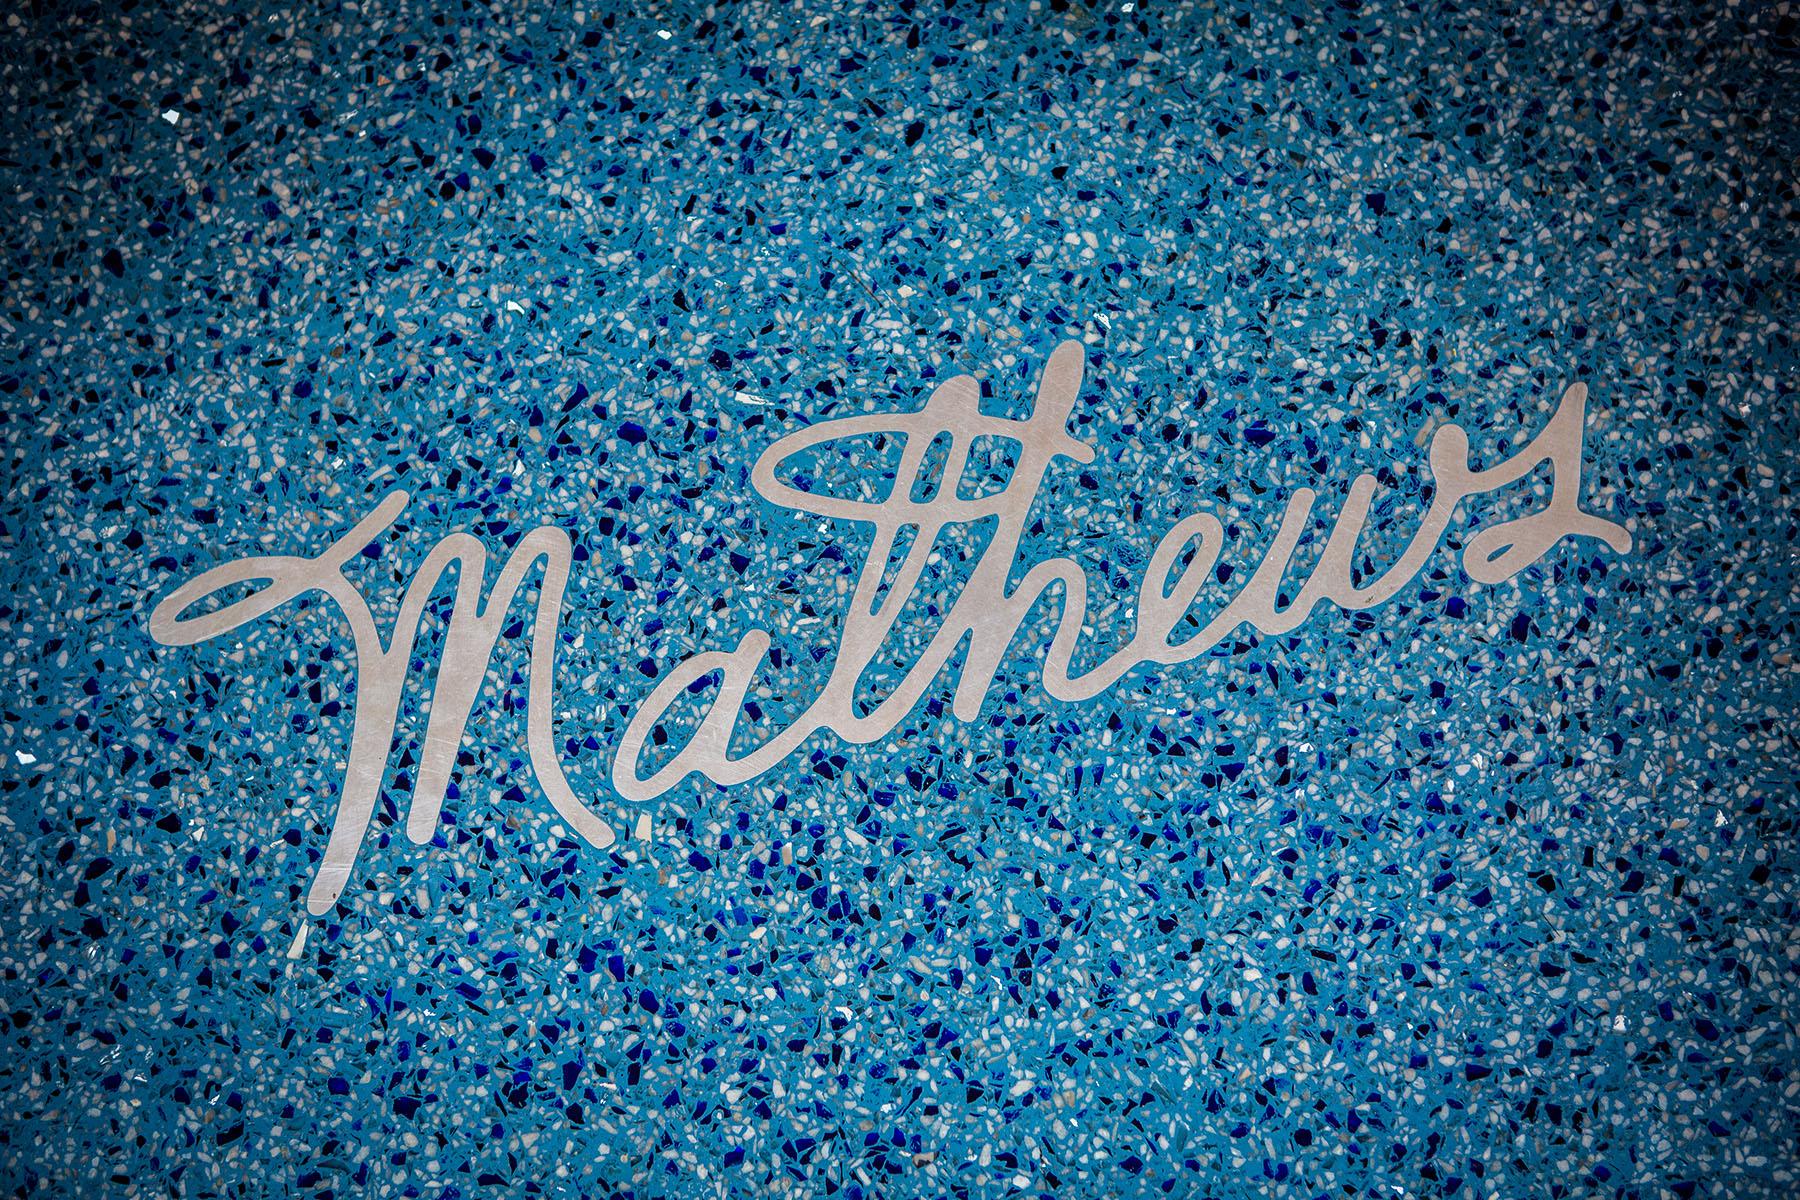 mathews_2_space_047.jpg